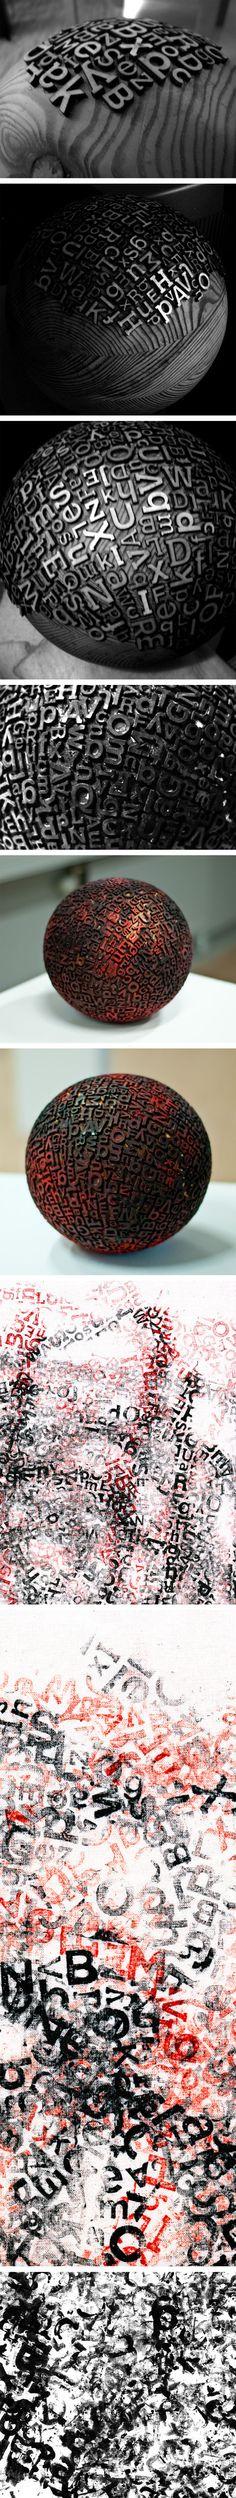 sphère typographique  - Eric Calderon